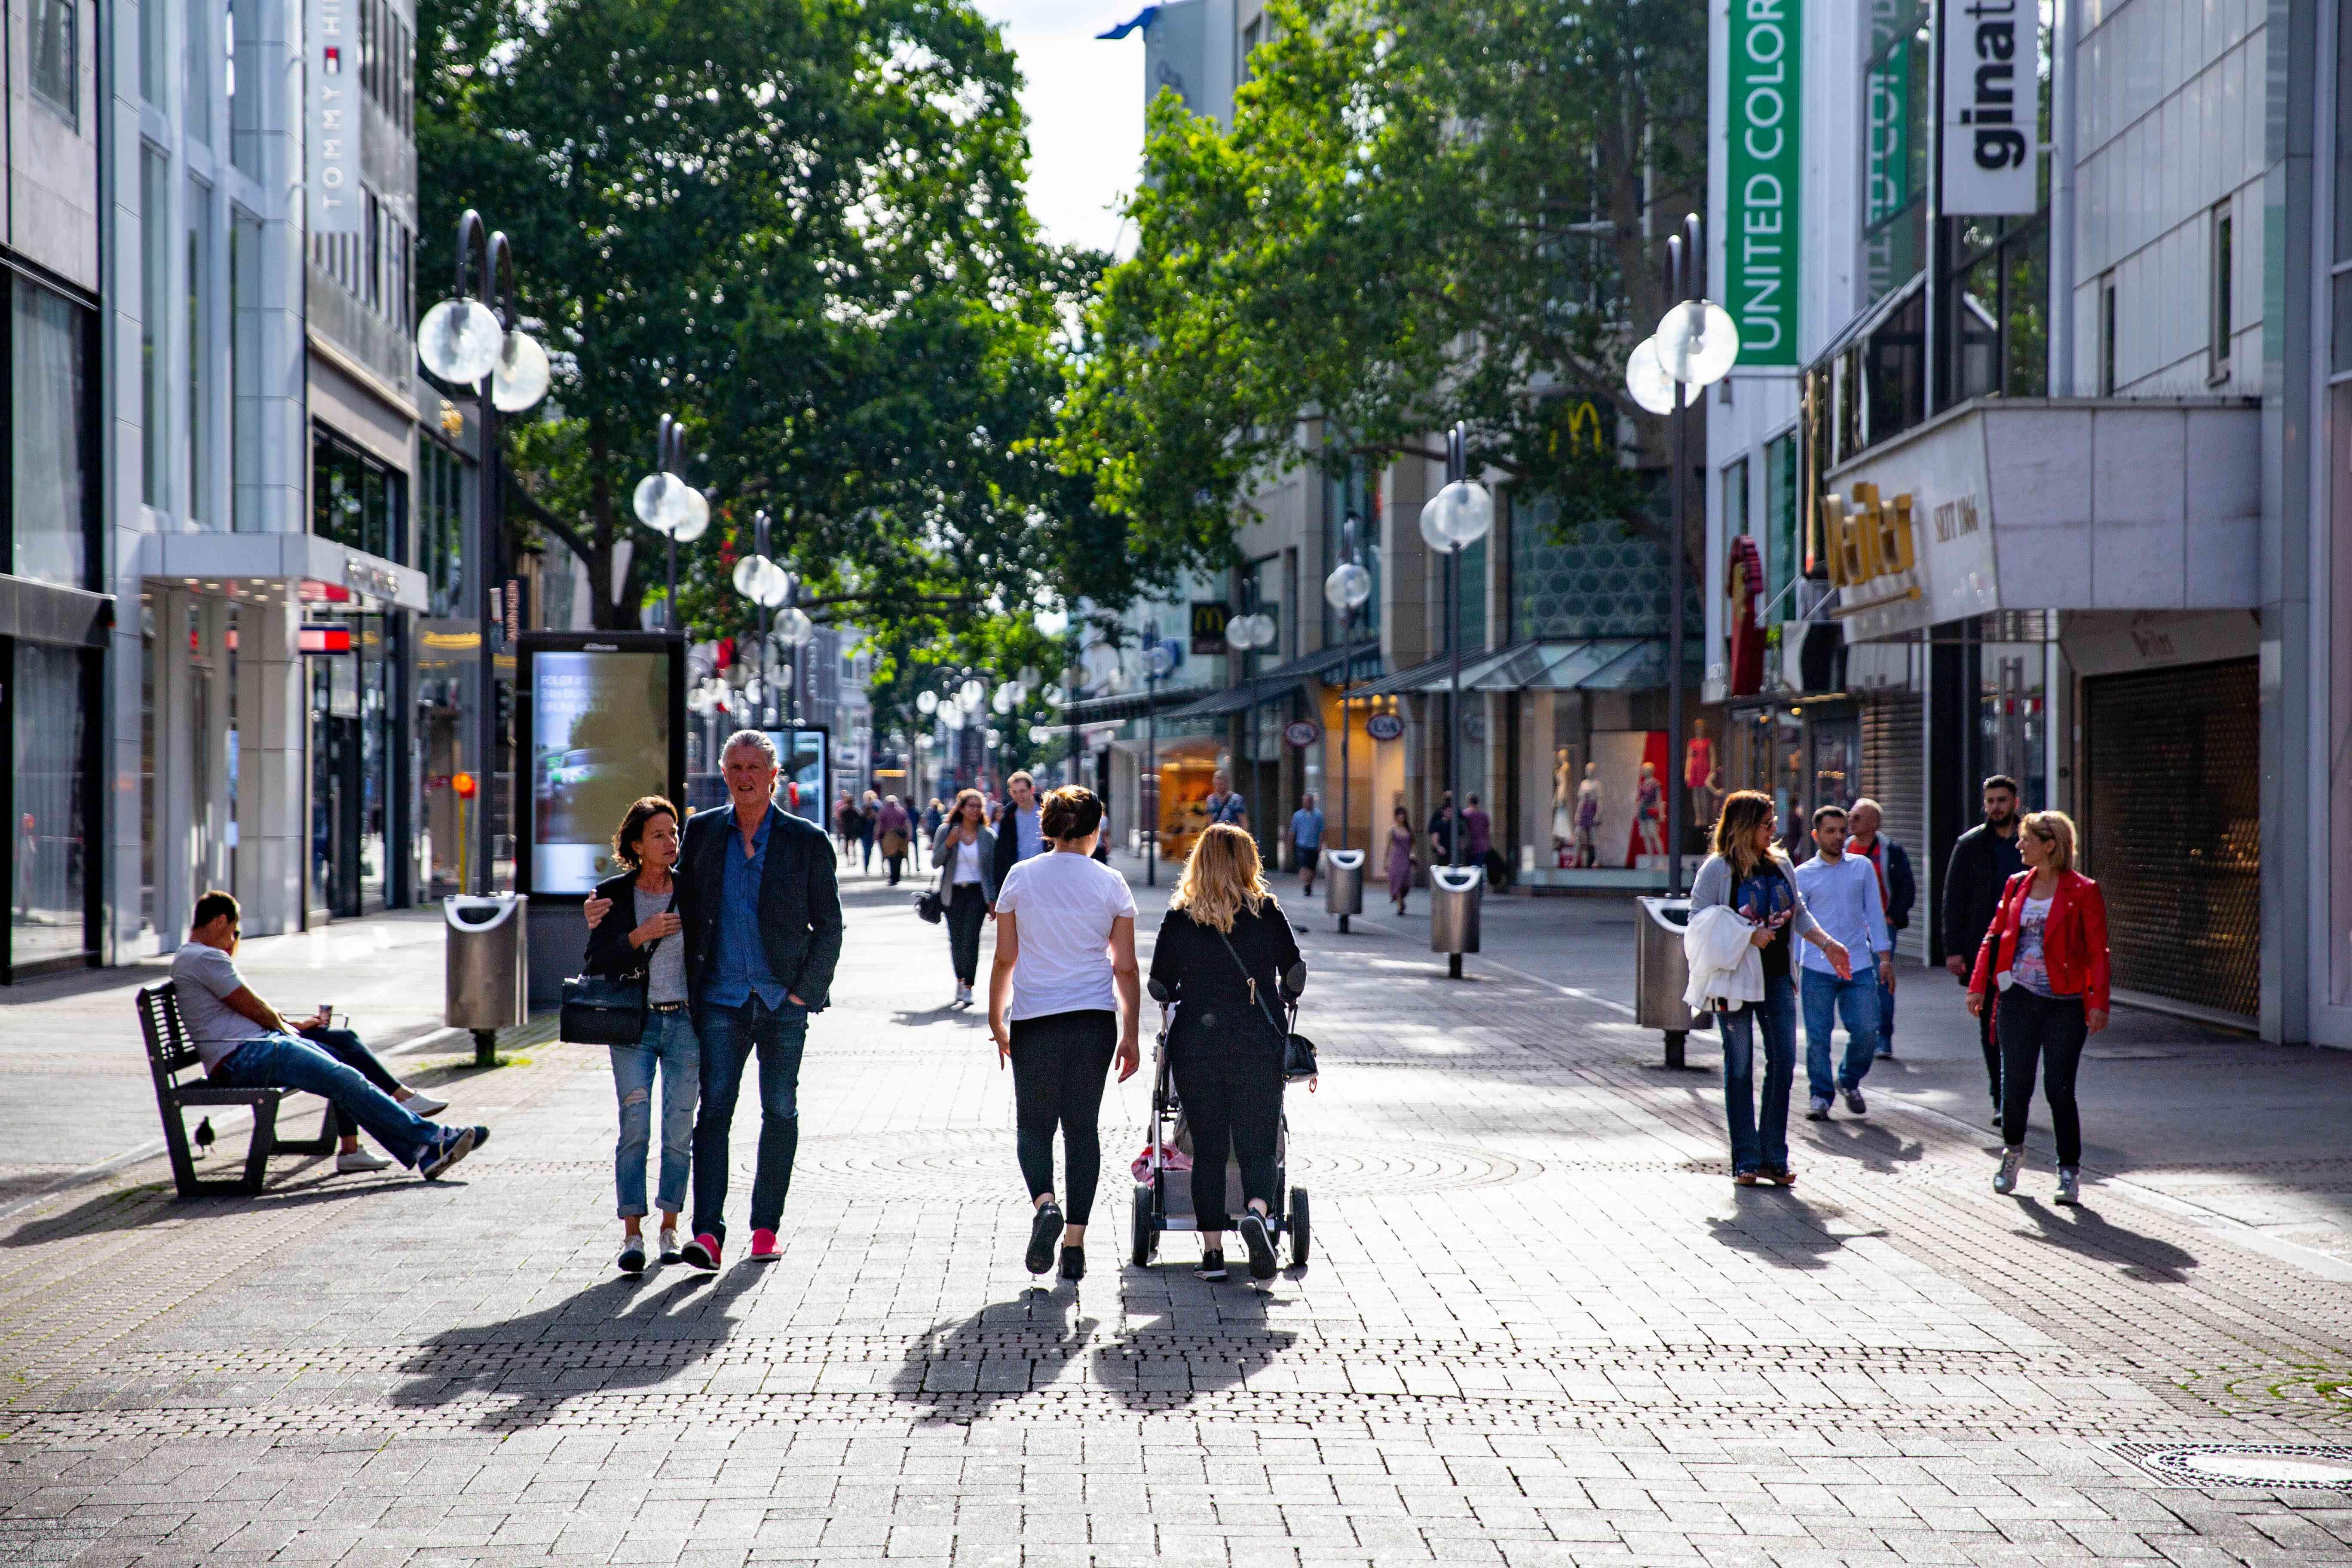 Gente caminando por la calle peatonal Schildergasse